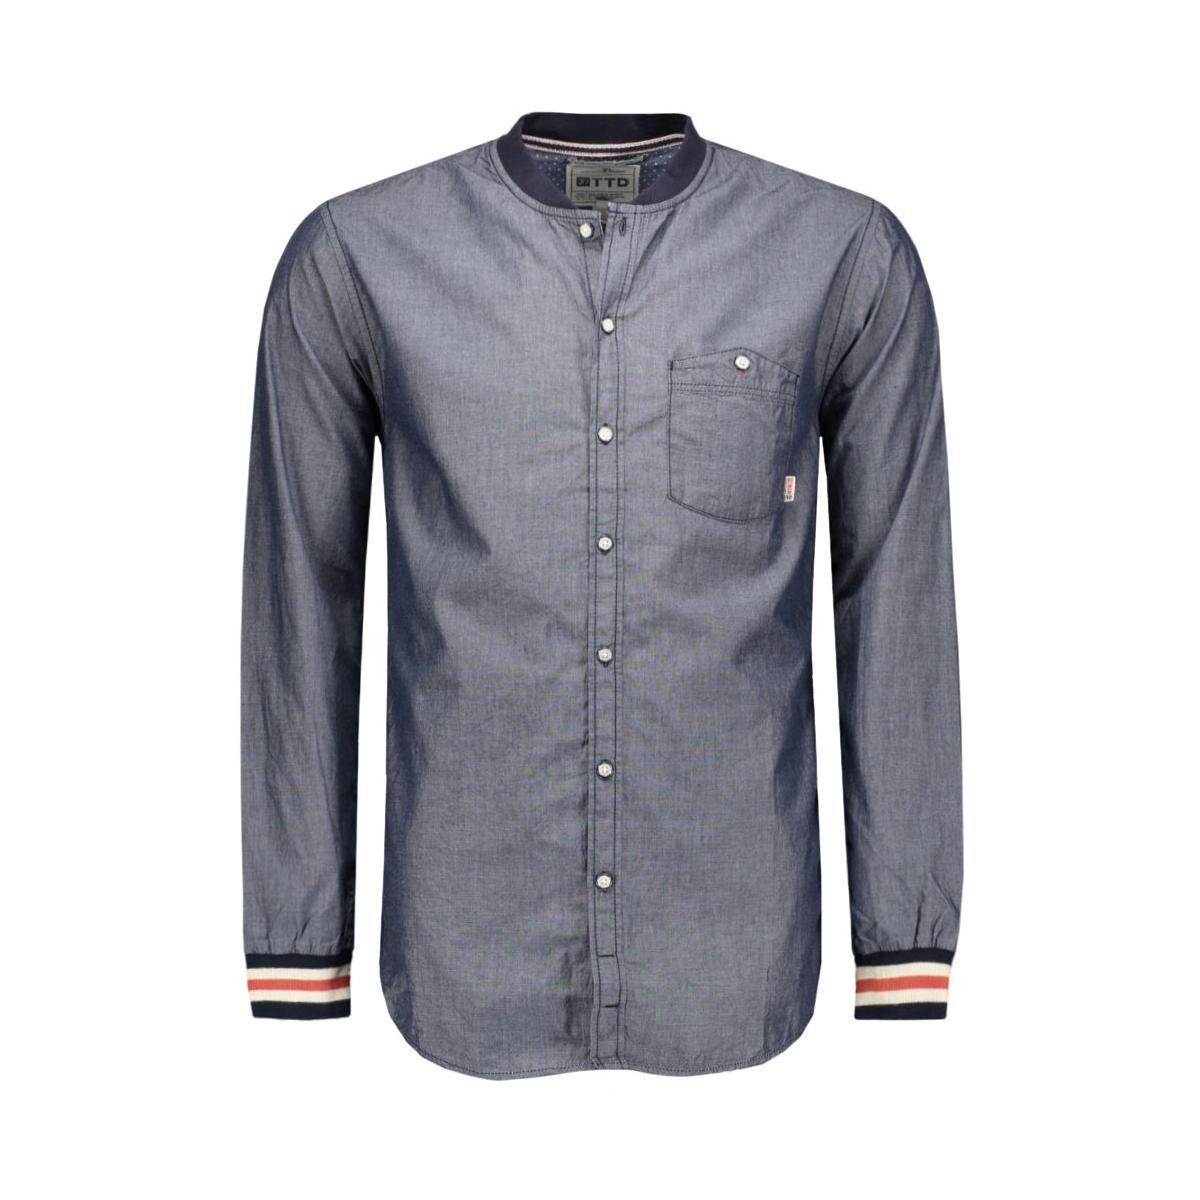 2032412.00.12 tom tailor overhemd 6576